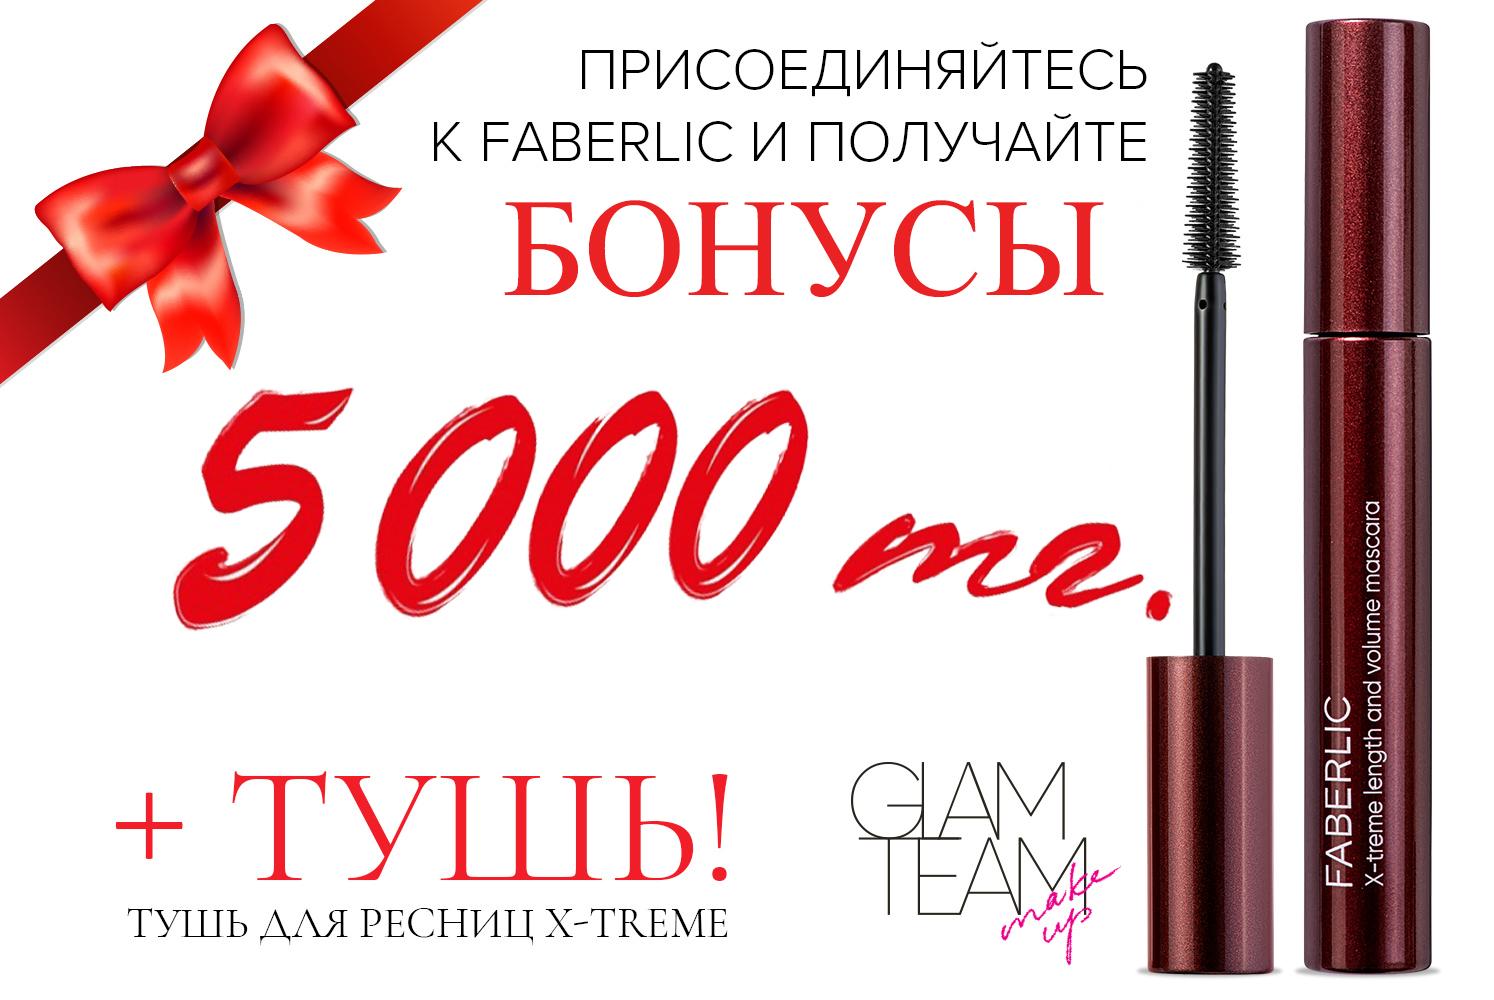 5000 тенге от Фаберлик в подарок новичкам